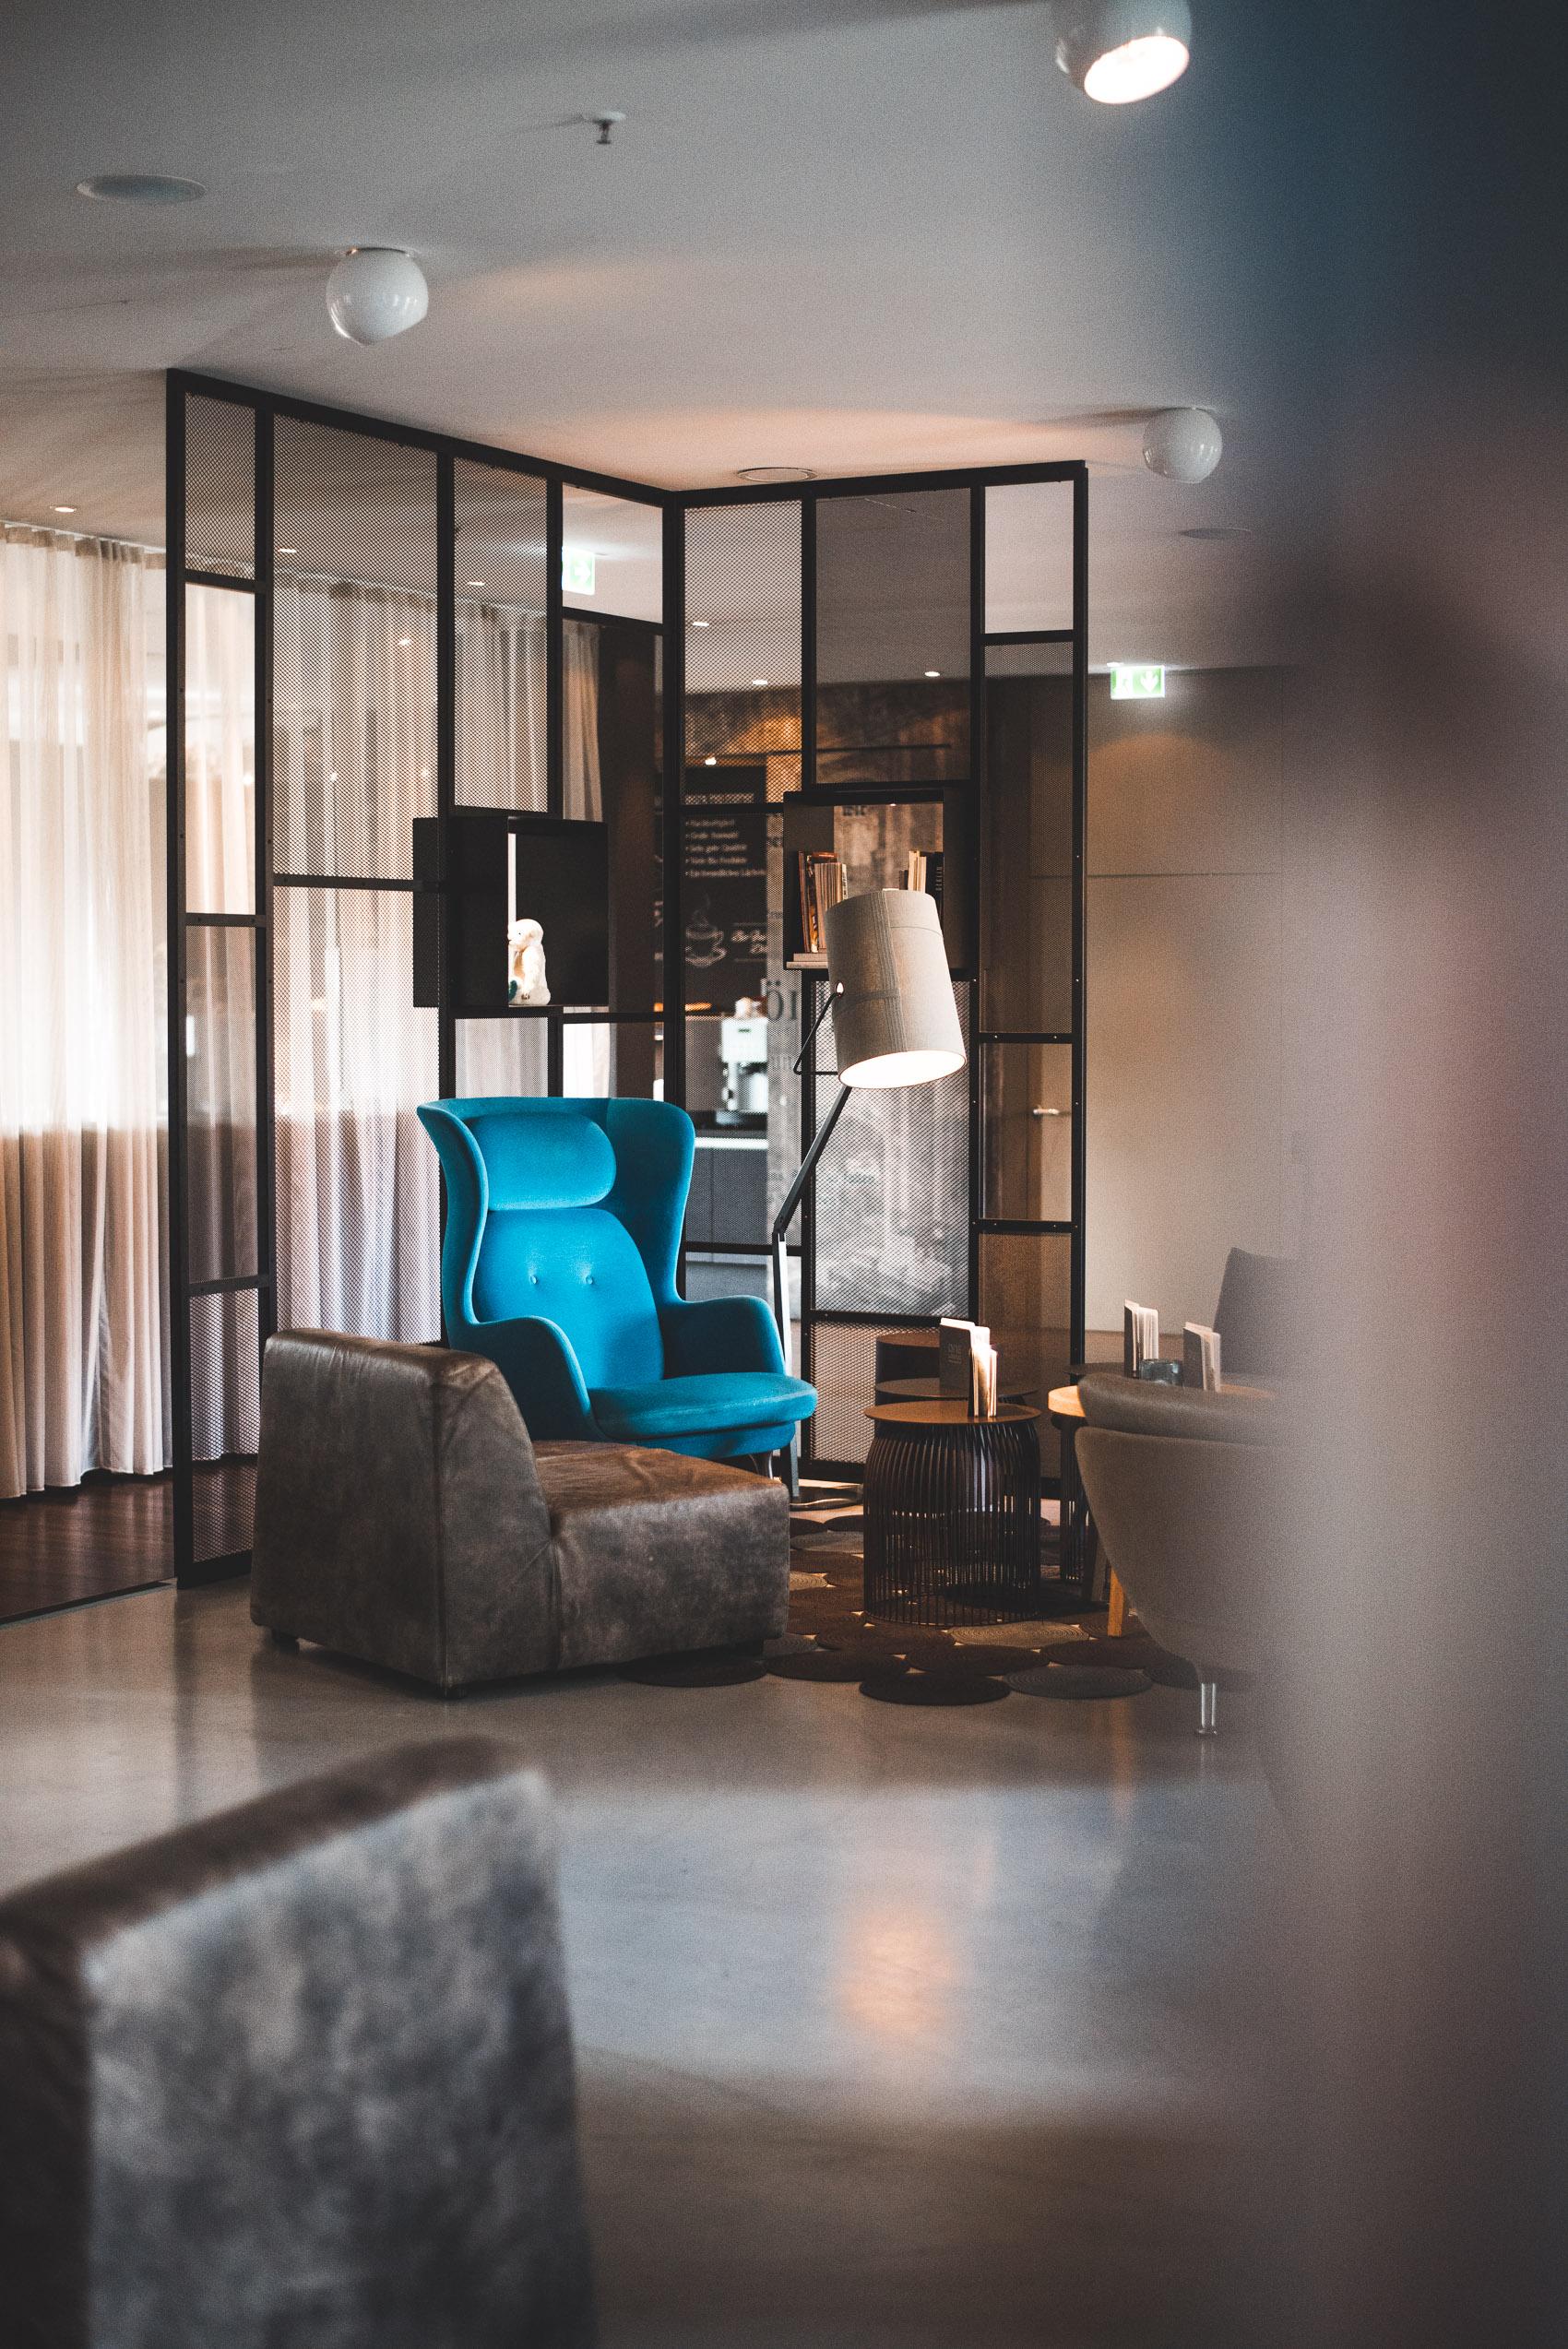 How to Design Like a Pro - 5 Hotel Design Secrets - heylilahey.